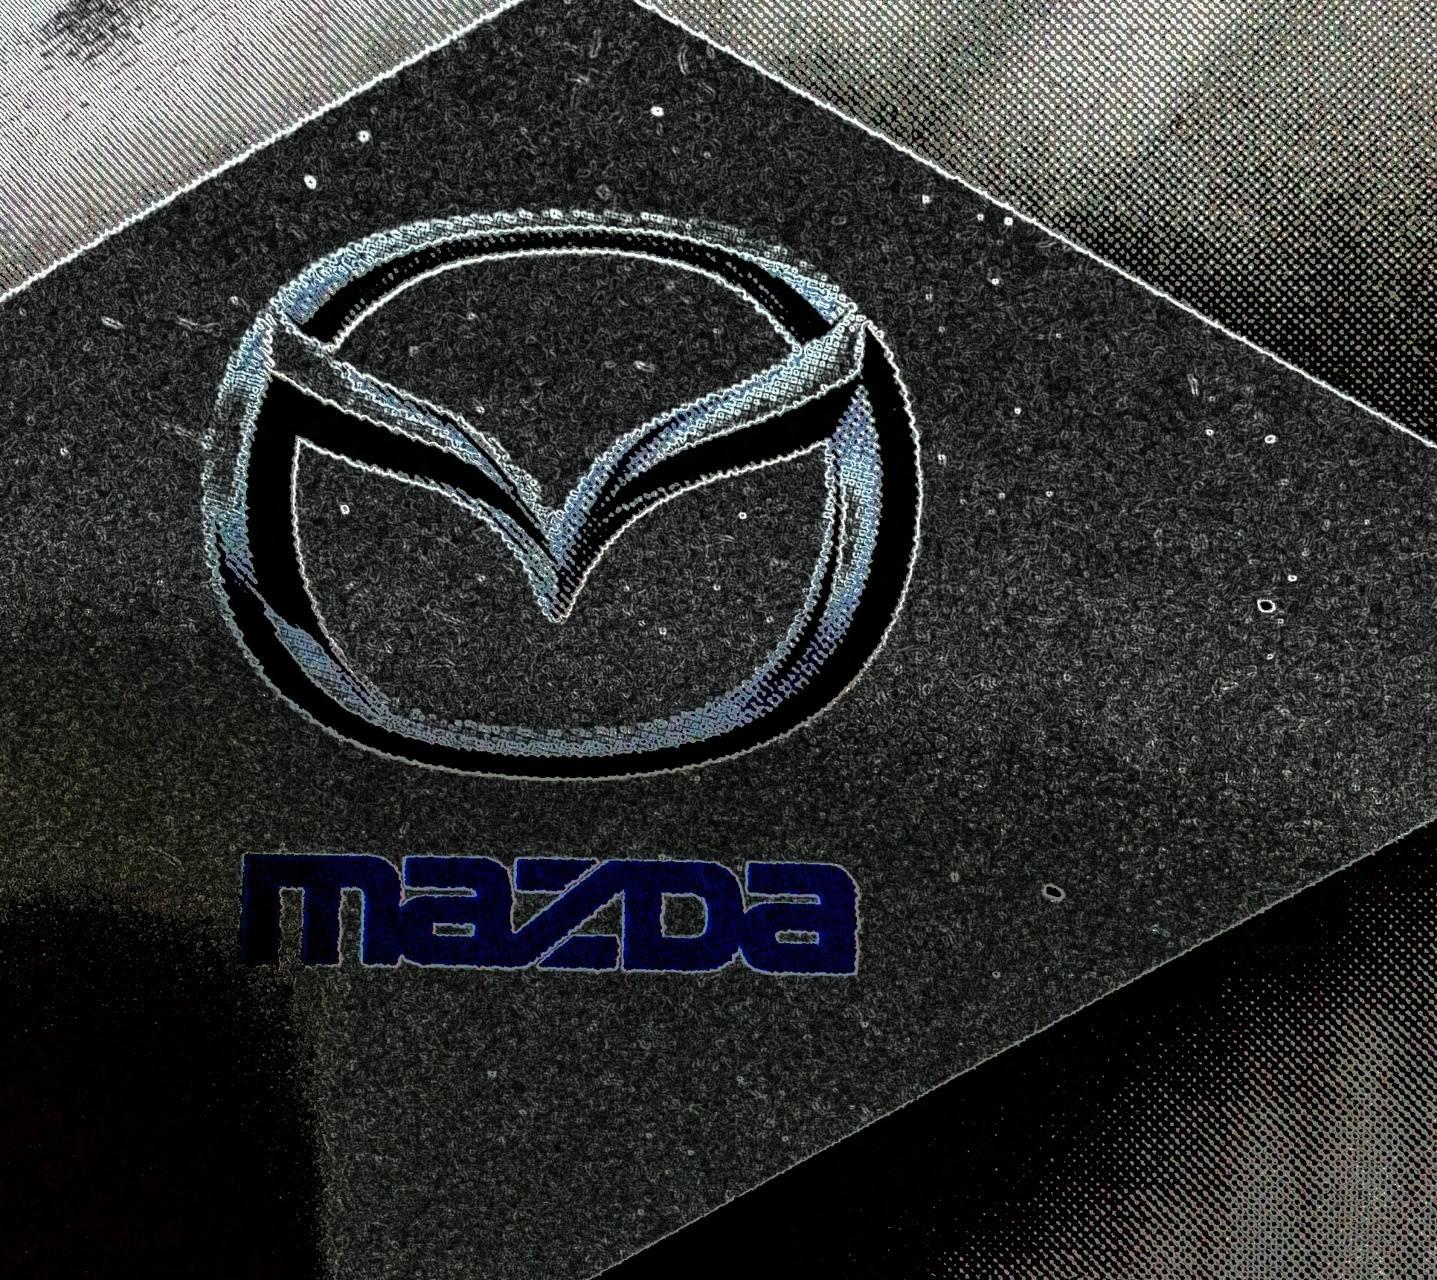 Mazda clear